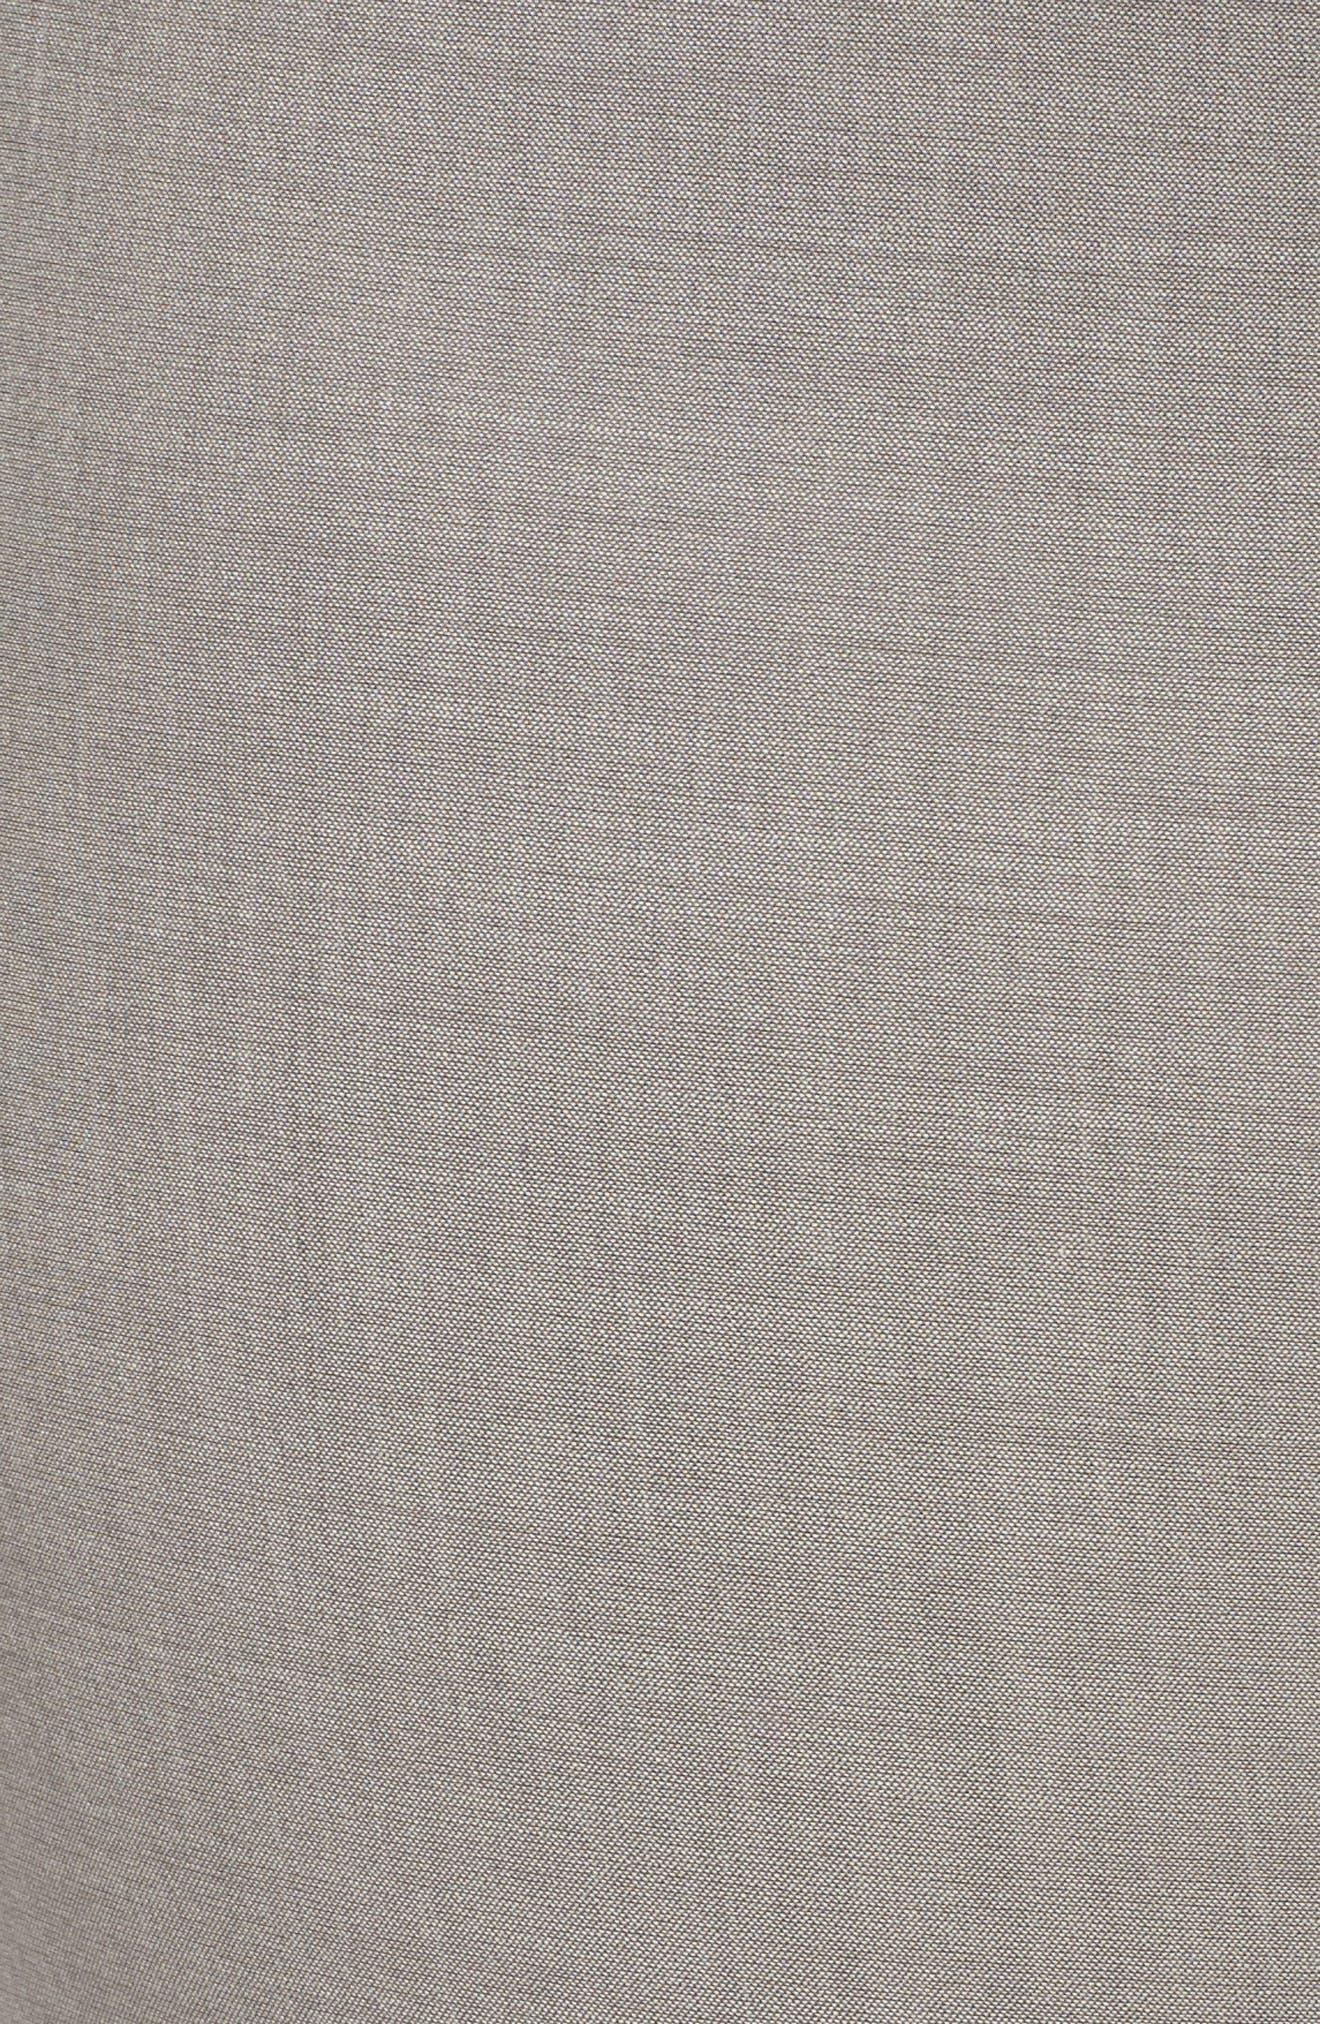 Bleecker Stretch Wool Suit Pants,                             Alternate thumbnail 5, color,                             Feather Grey Melange